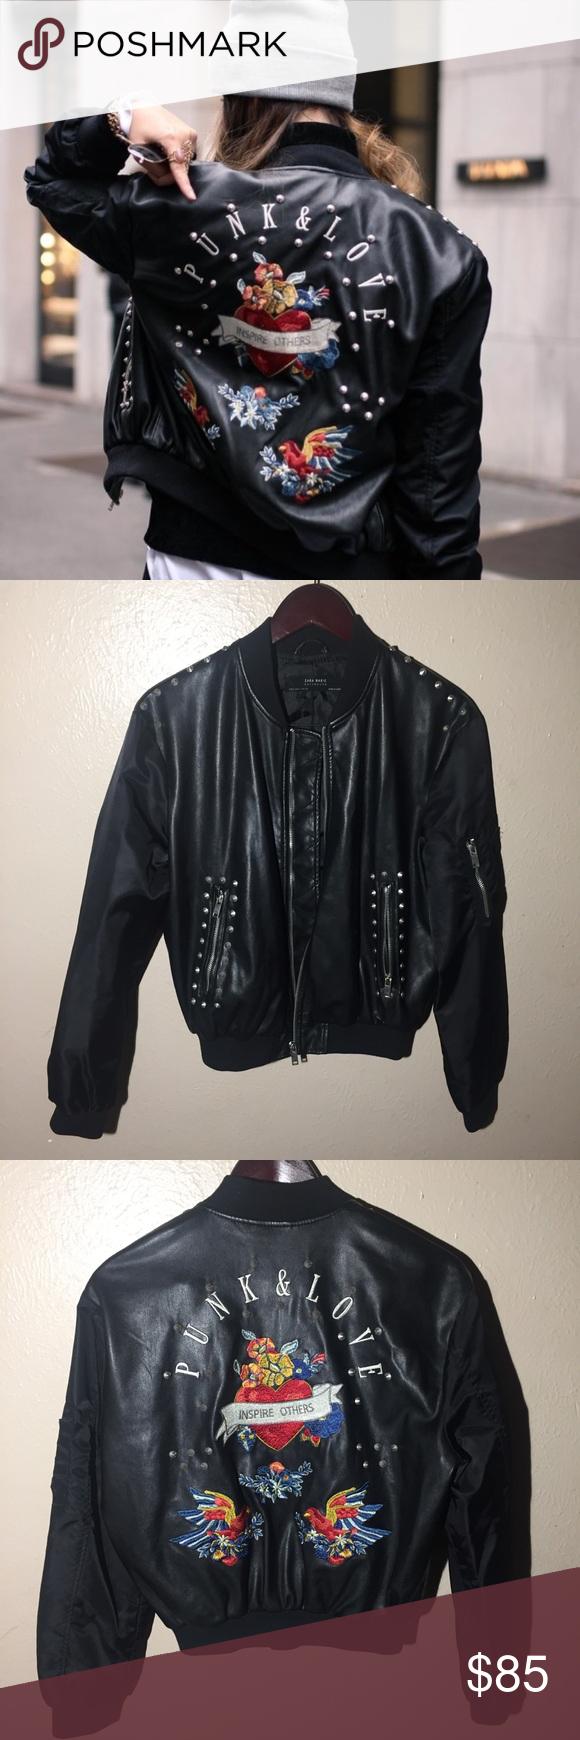 Zara Punk Love Studded Embroidered Jacket Small Embroidered Jacket Embroidered Bomber Jacket Zara [ 1740 x 580 Pixel ]